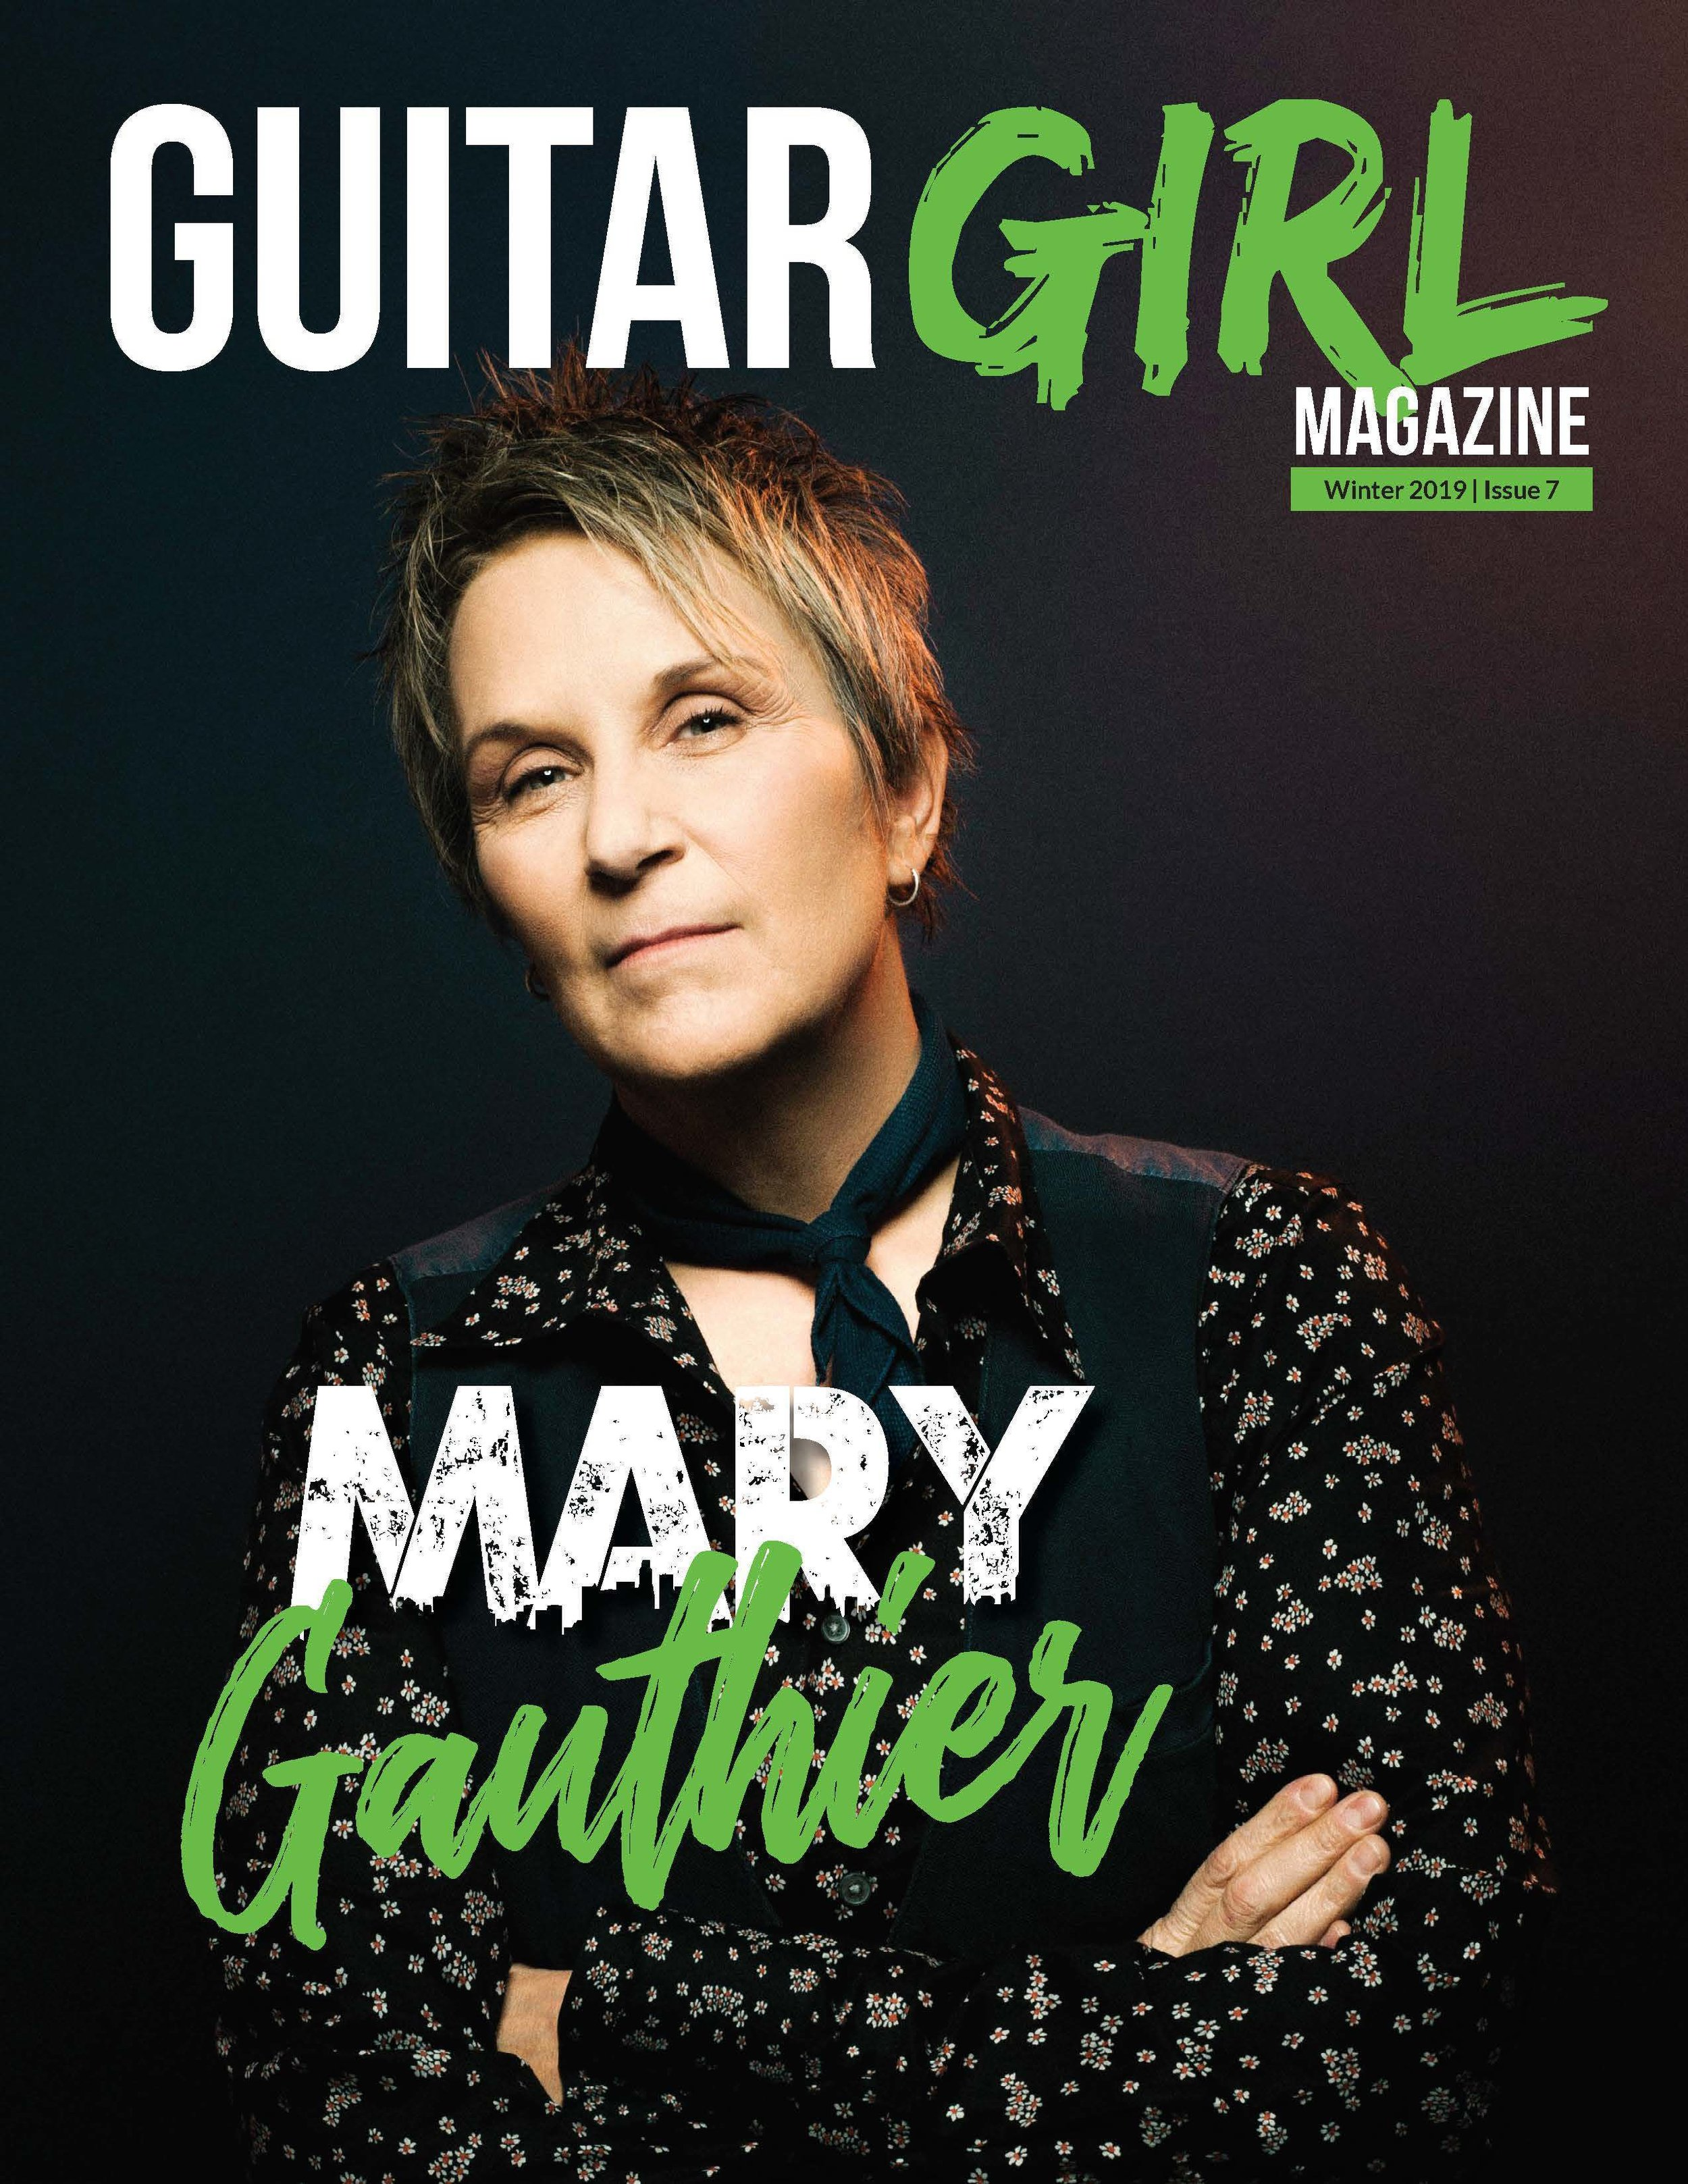 GGM-Issue-7-1-Gauthier-Cover.jpg